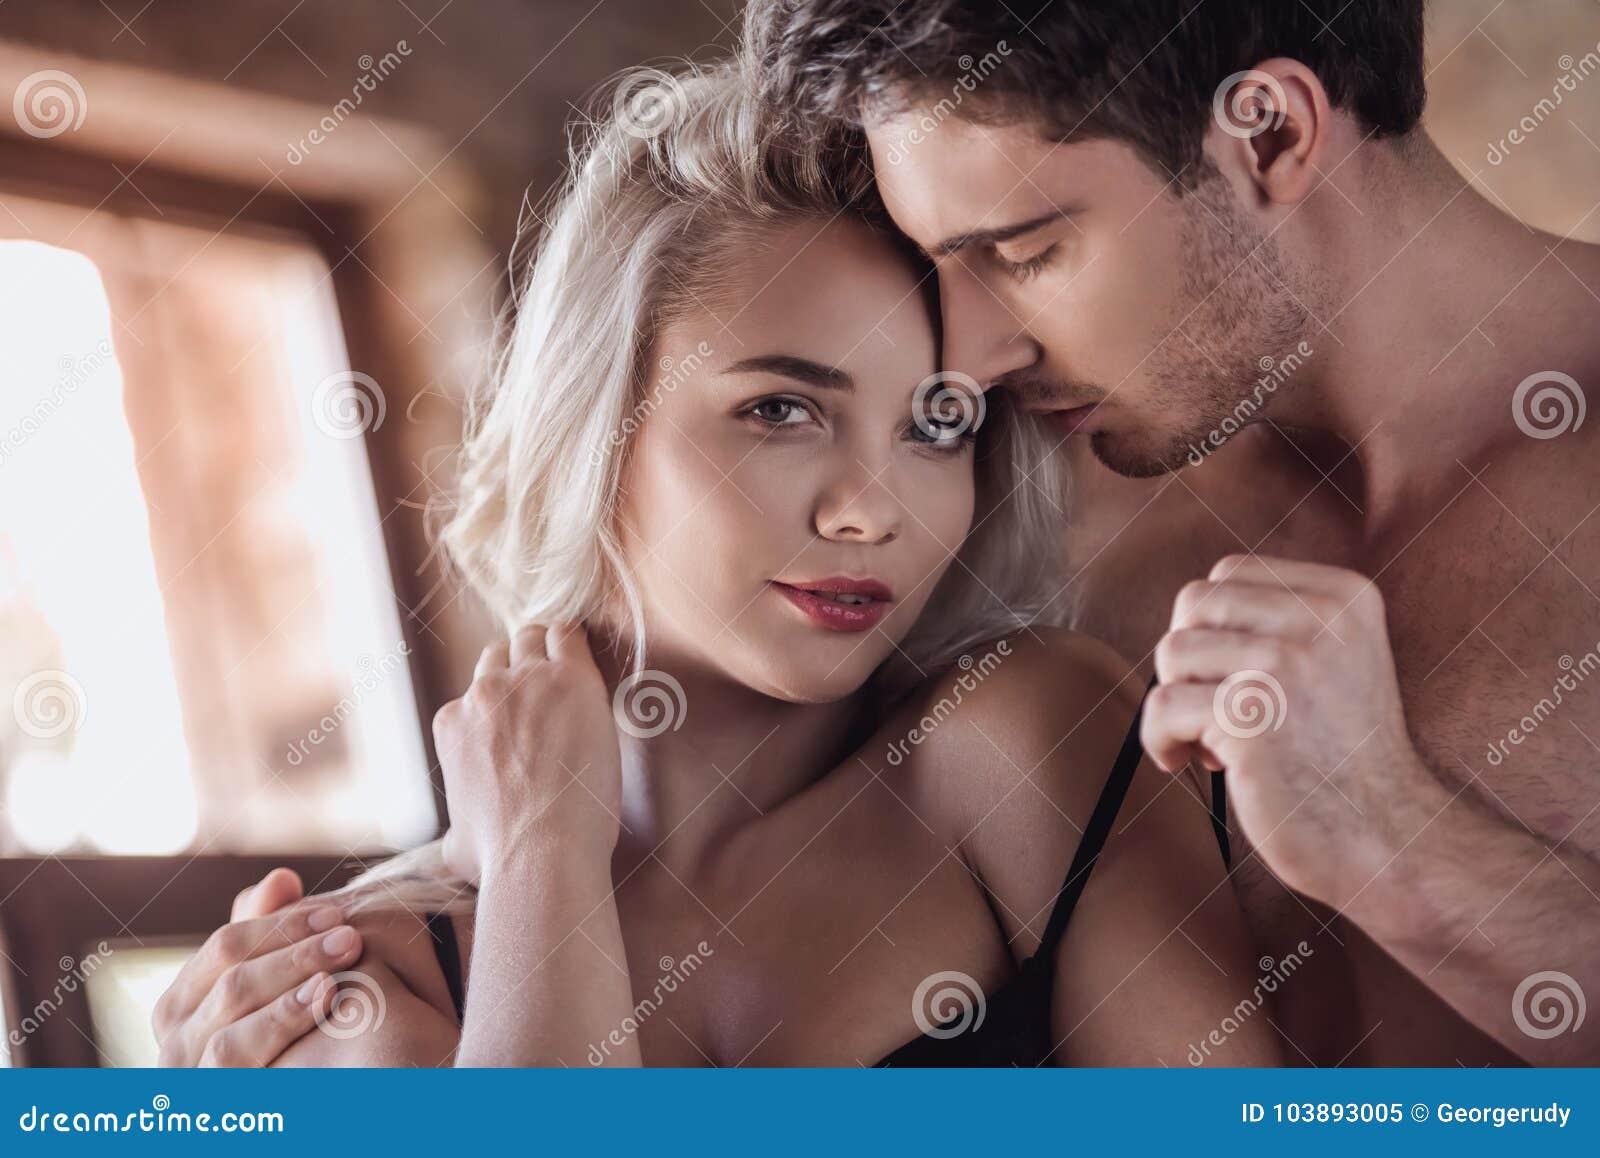 jeunes dames sexe femme va lesbienne porno